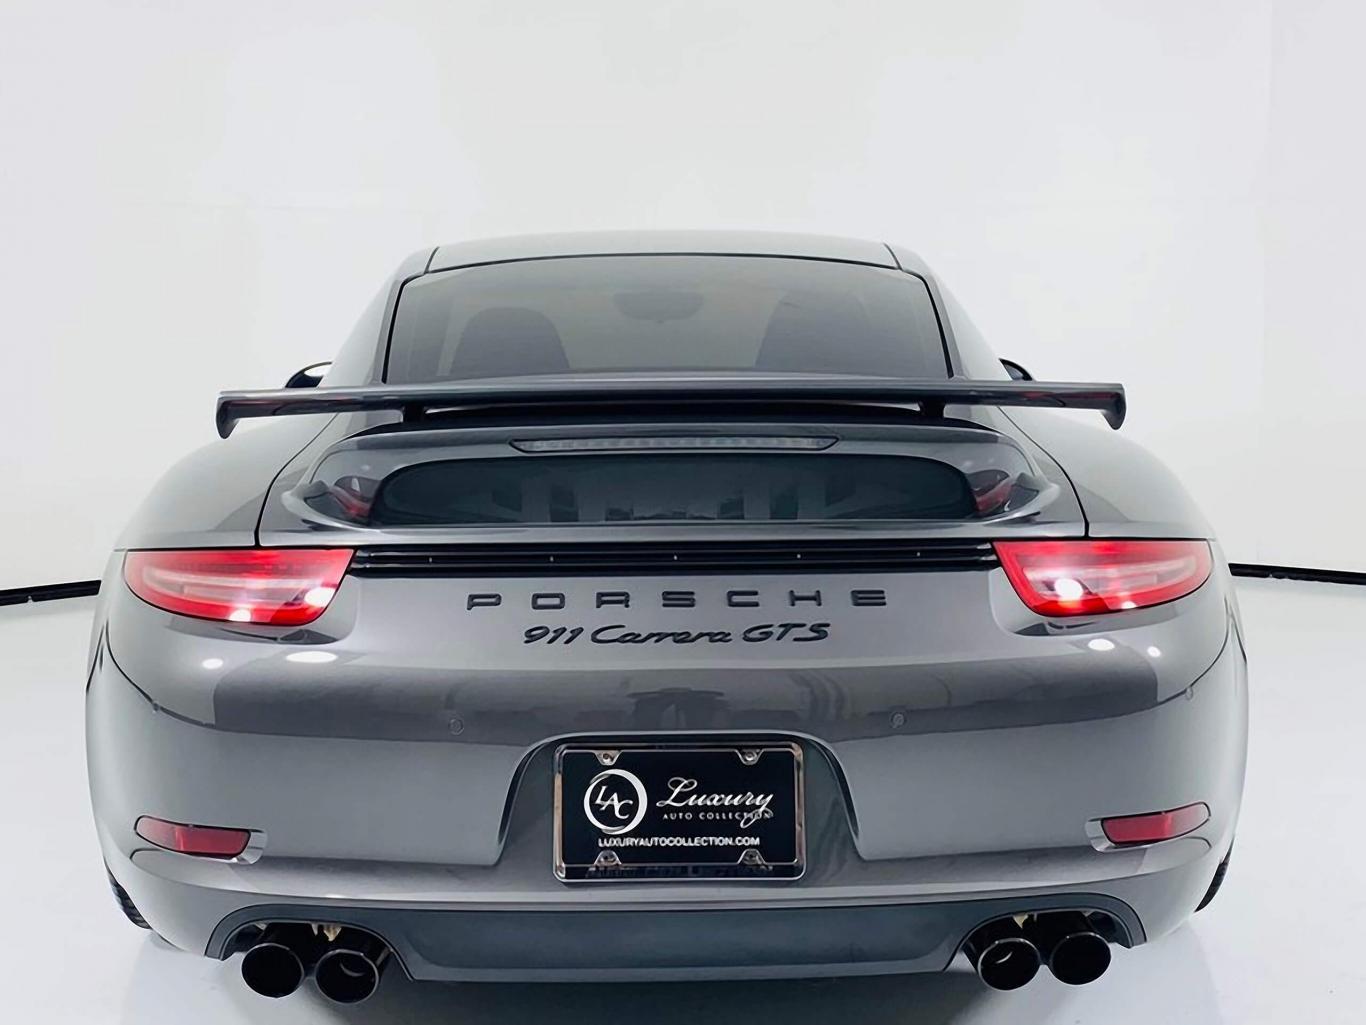 911 Carrera Gts >> Porsche 911 Carrera Gts Coupe